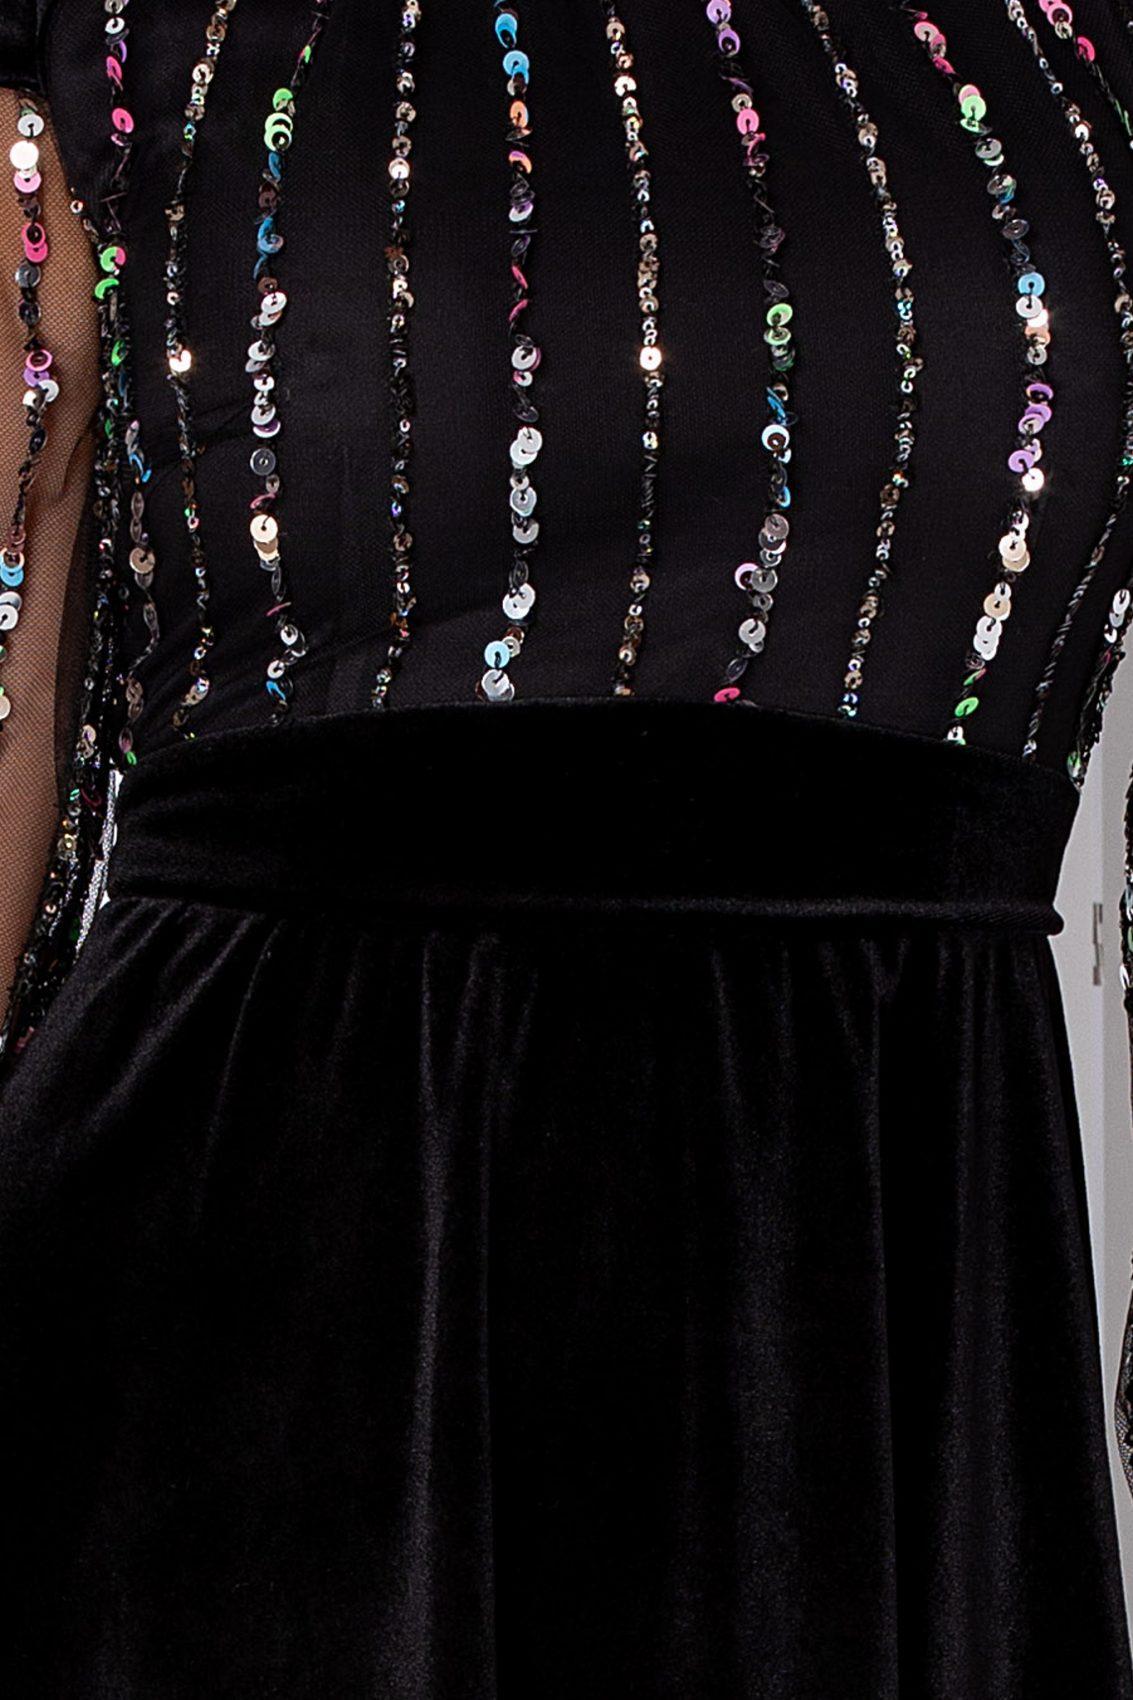 Moze Aniella Μαύρο Φόρεμα 5268